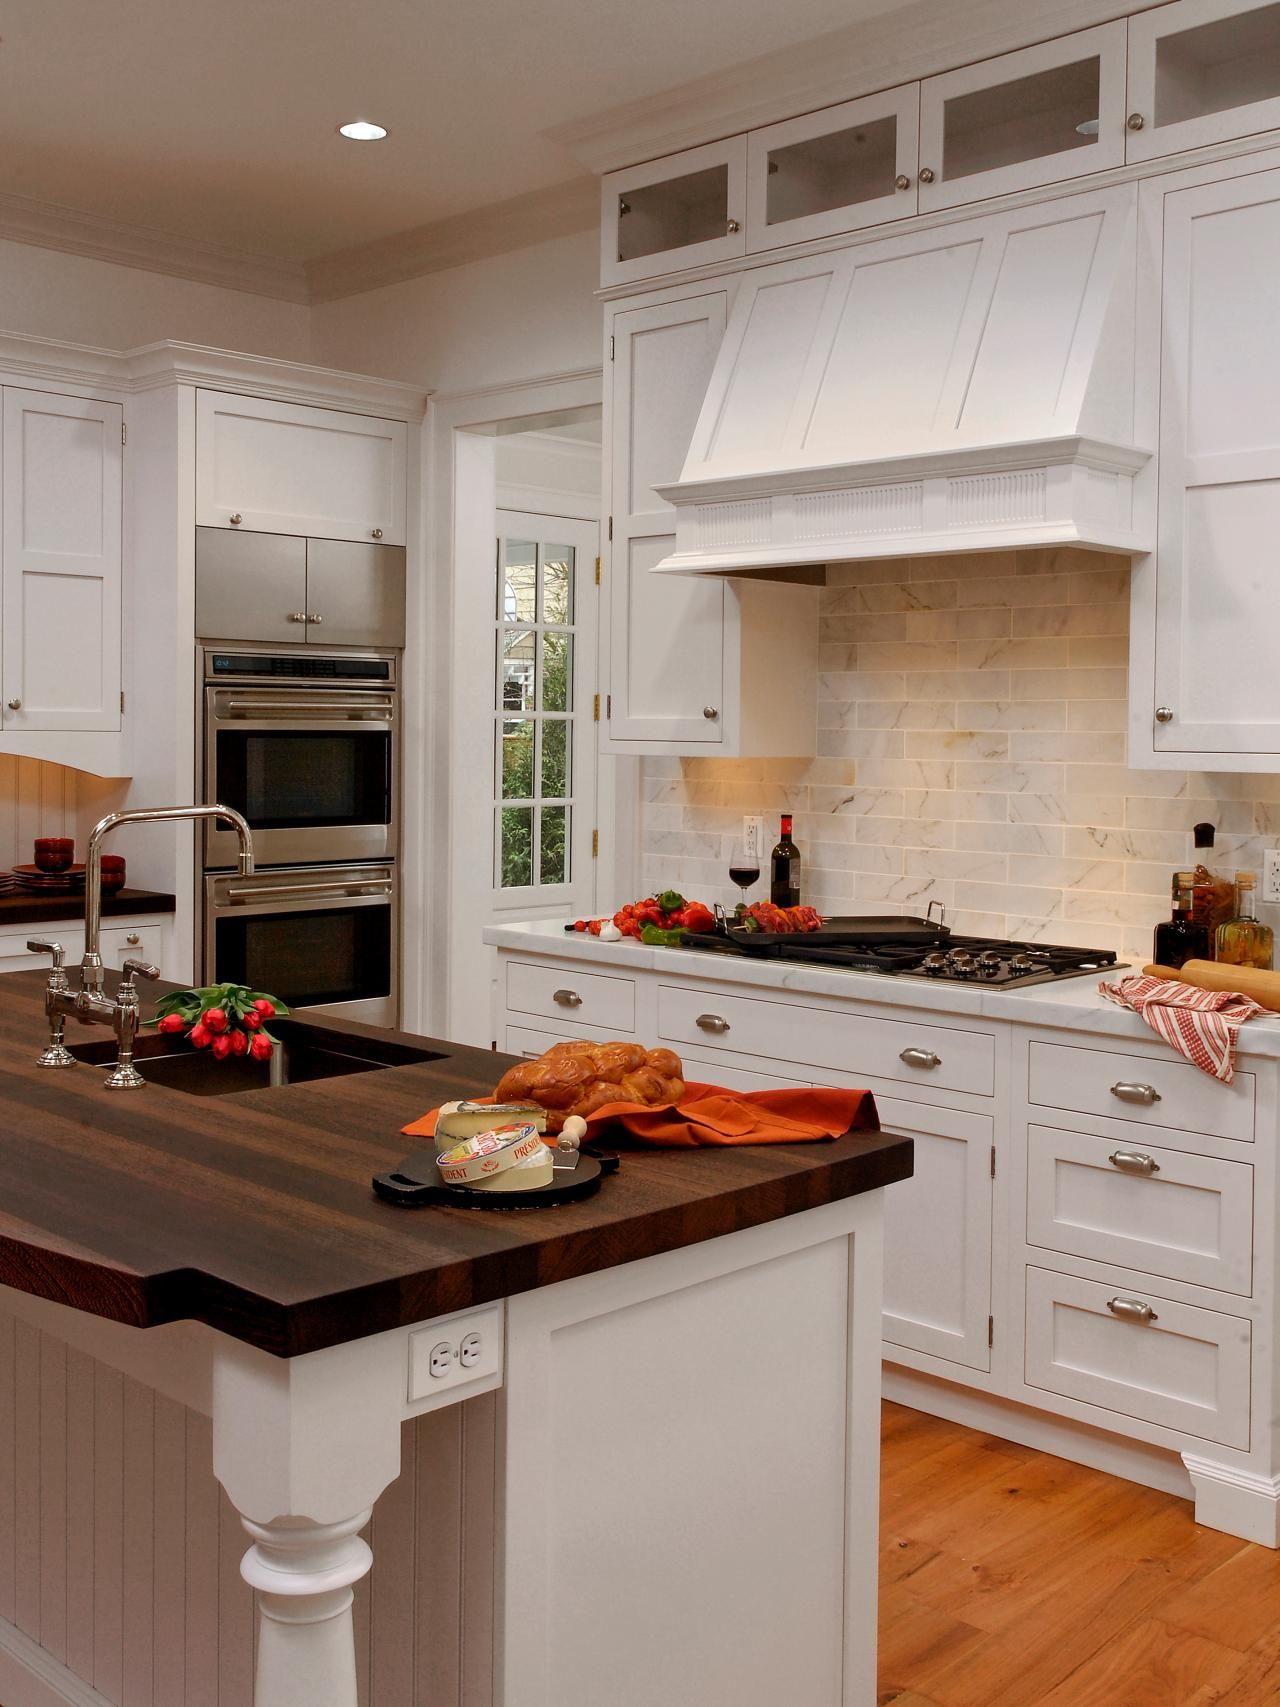 kitchen islands: beautiful, functional design options | kitchens